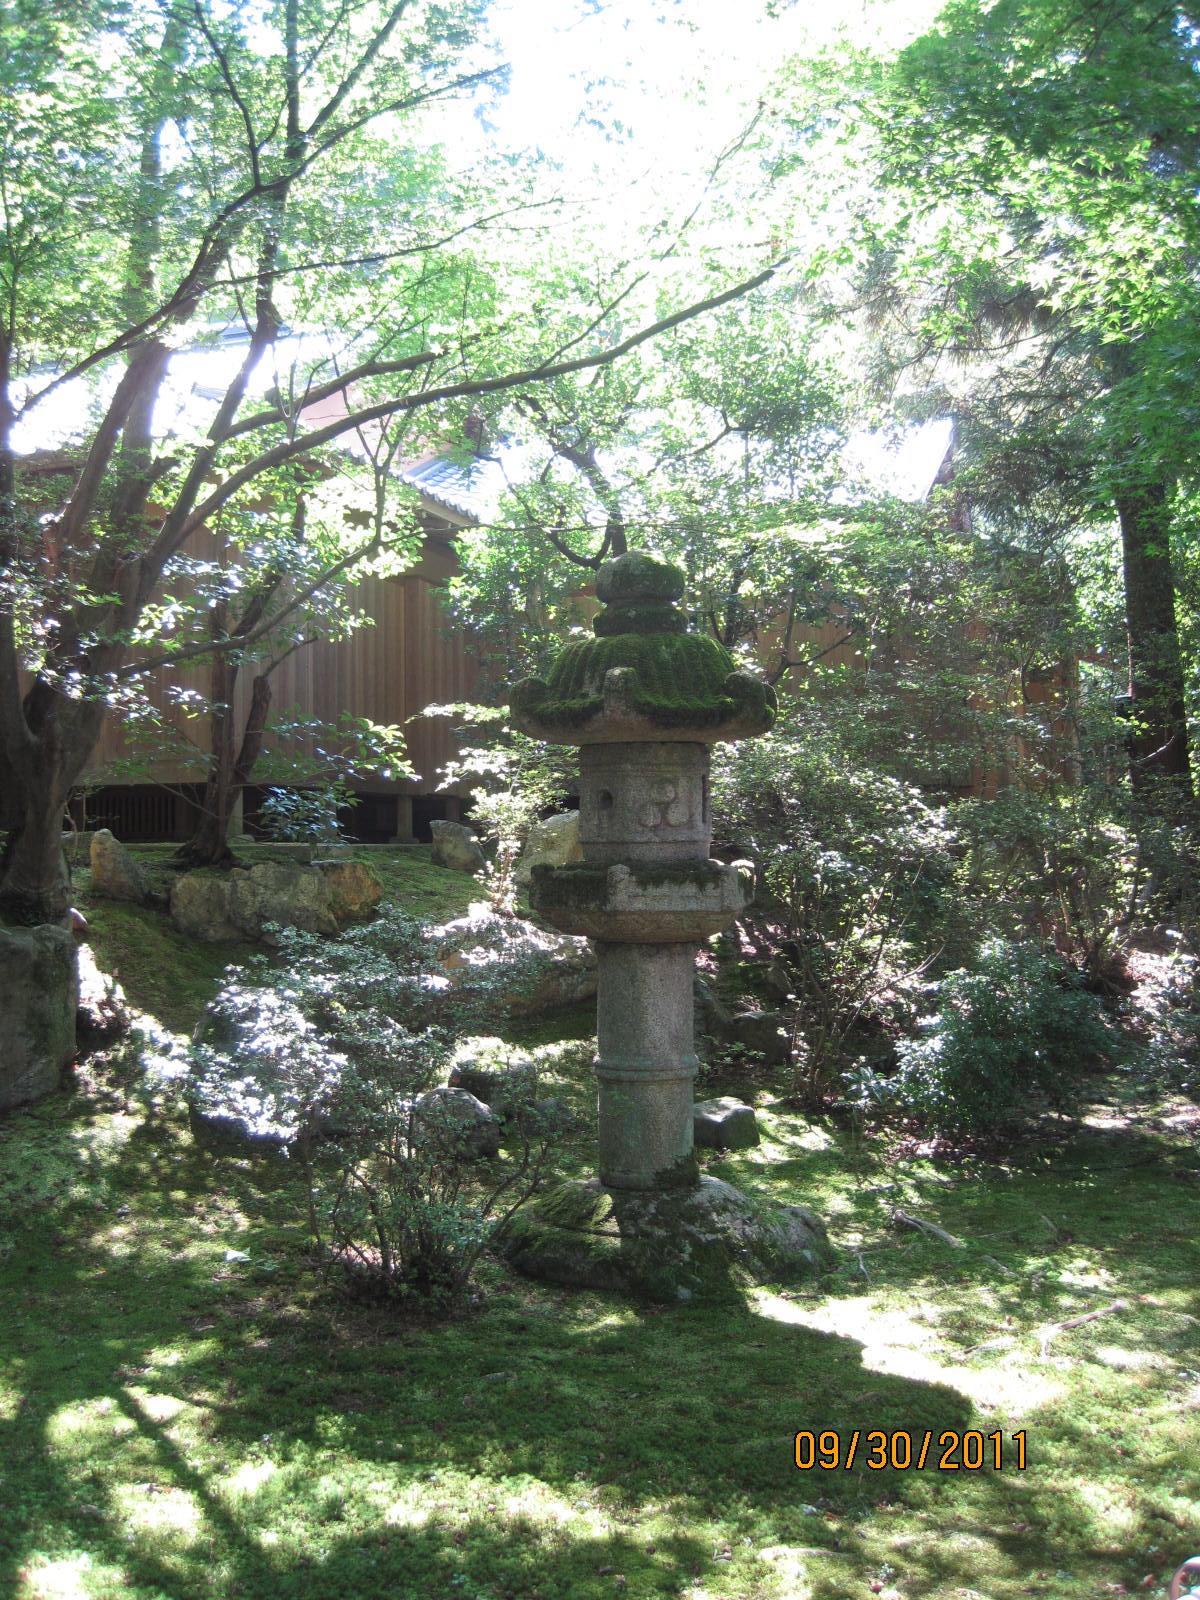 A moss garden kyoto margaret atwood year of the flood - Moosgarten kyoto ...